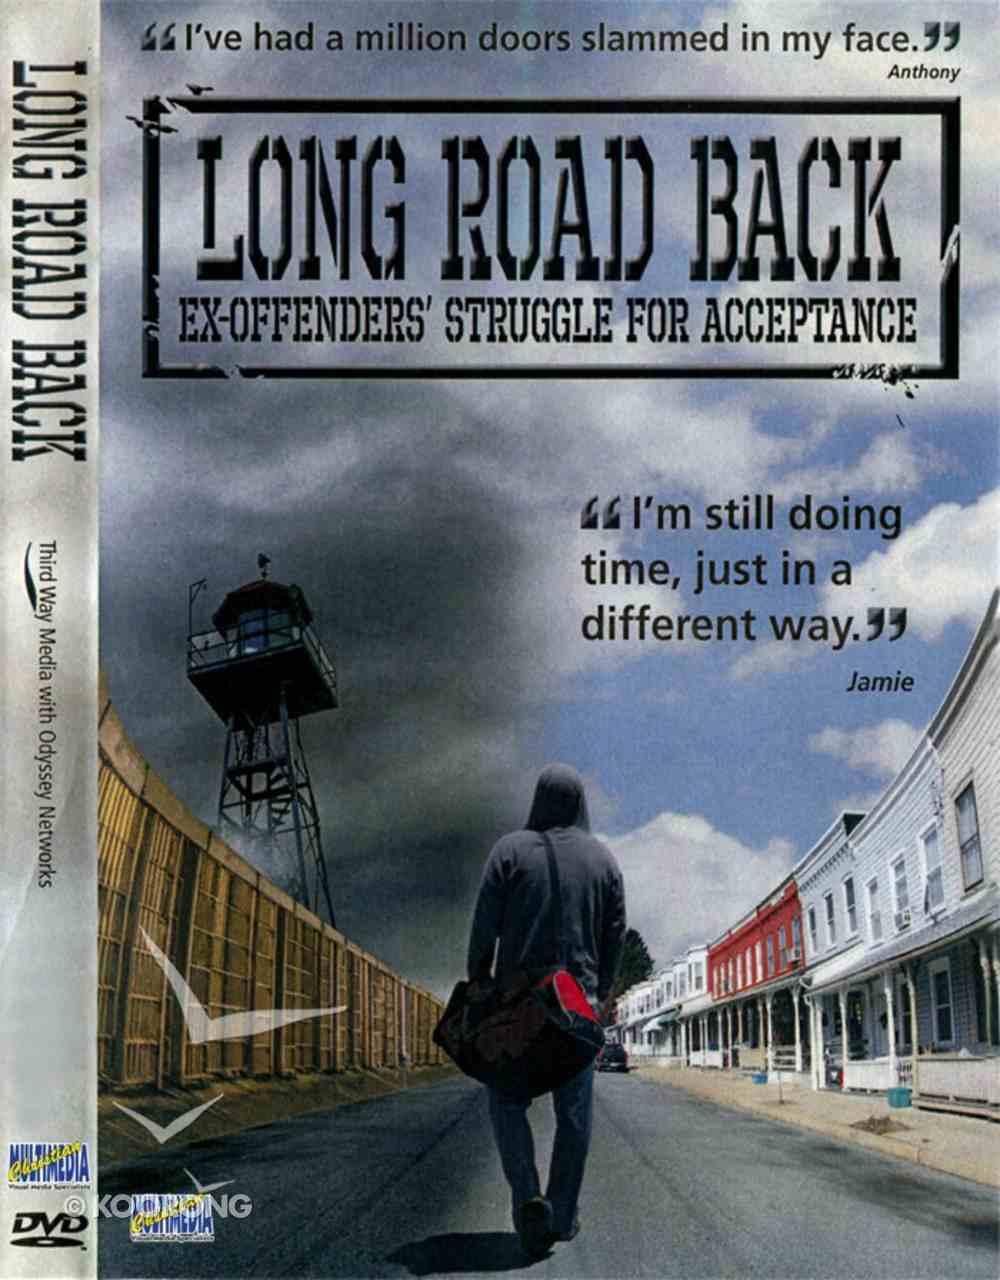 Long Road Back DVD